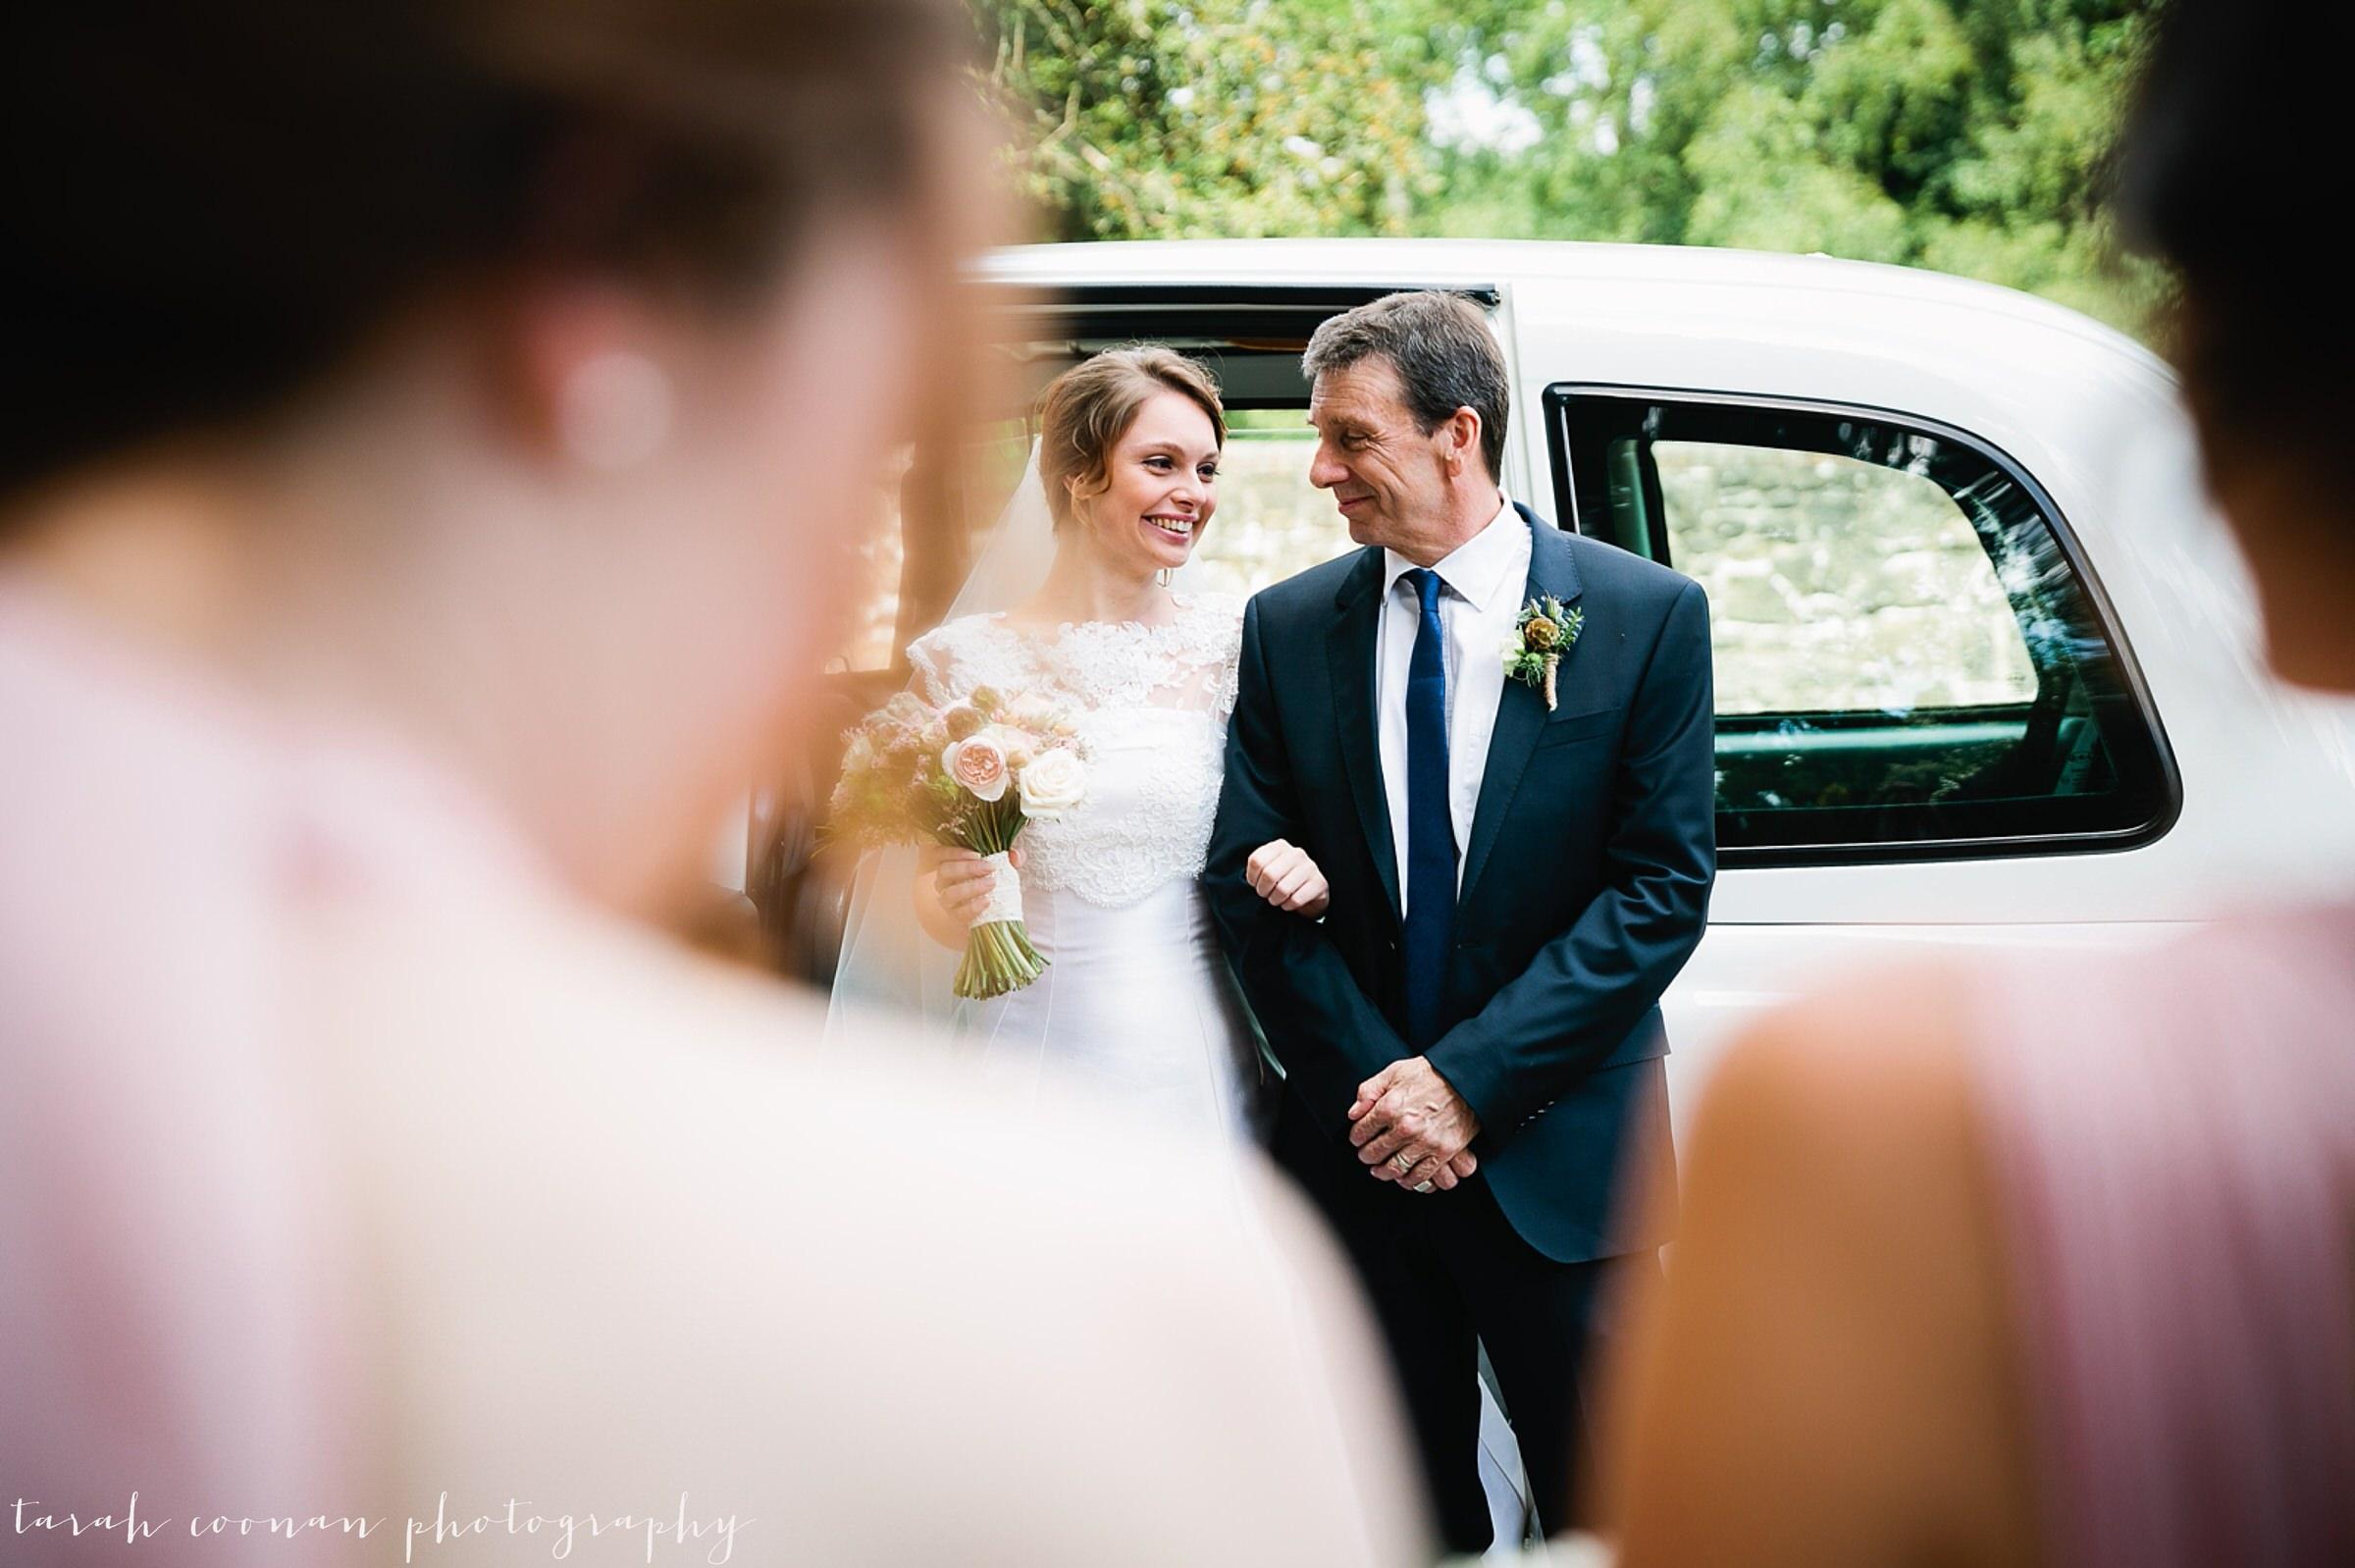 adoring father daughter wedding